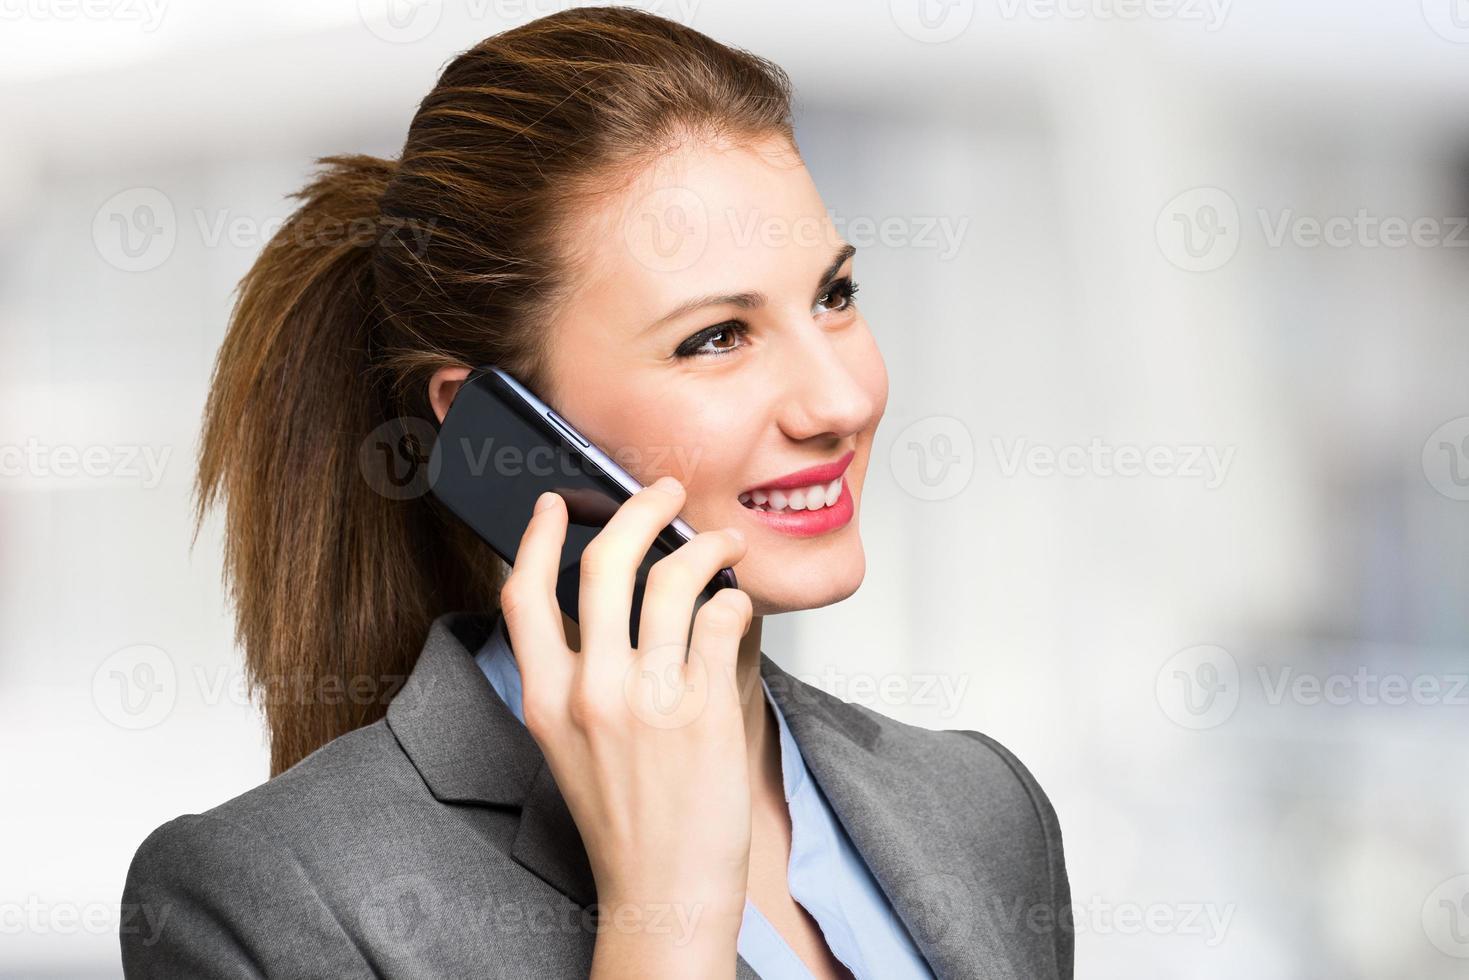 junge Frau am Telefon sprechen foto